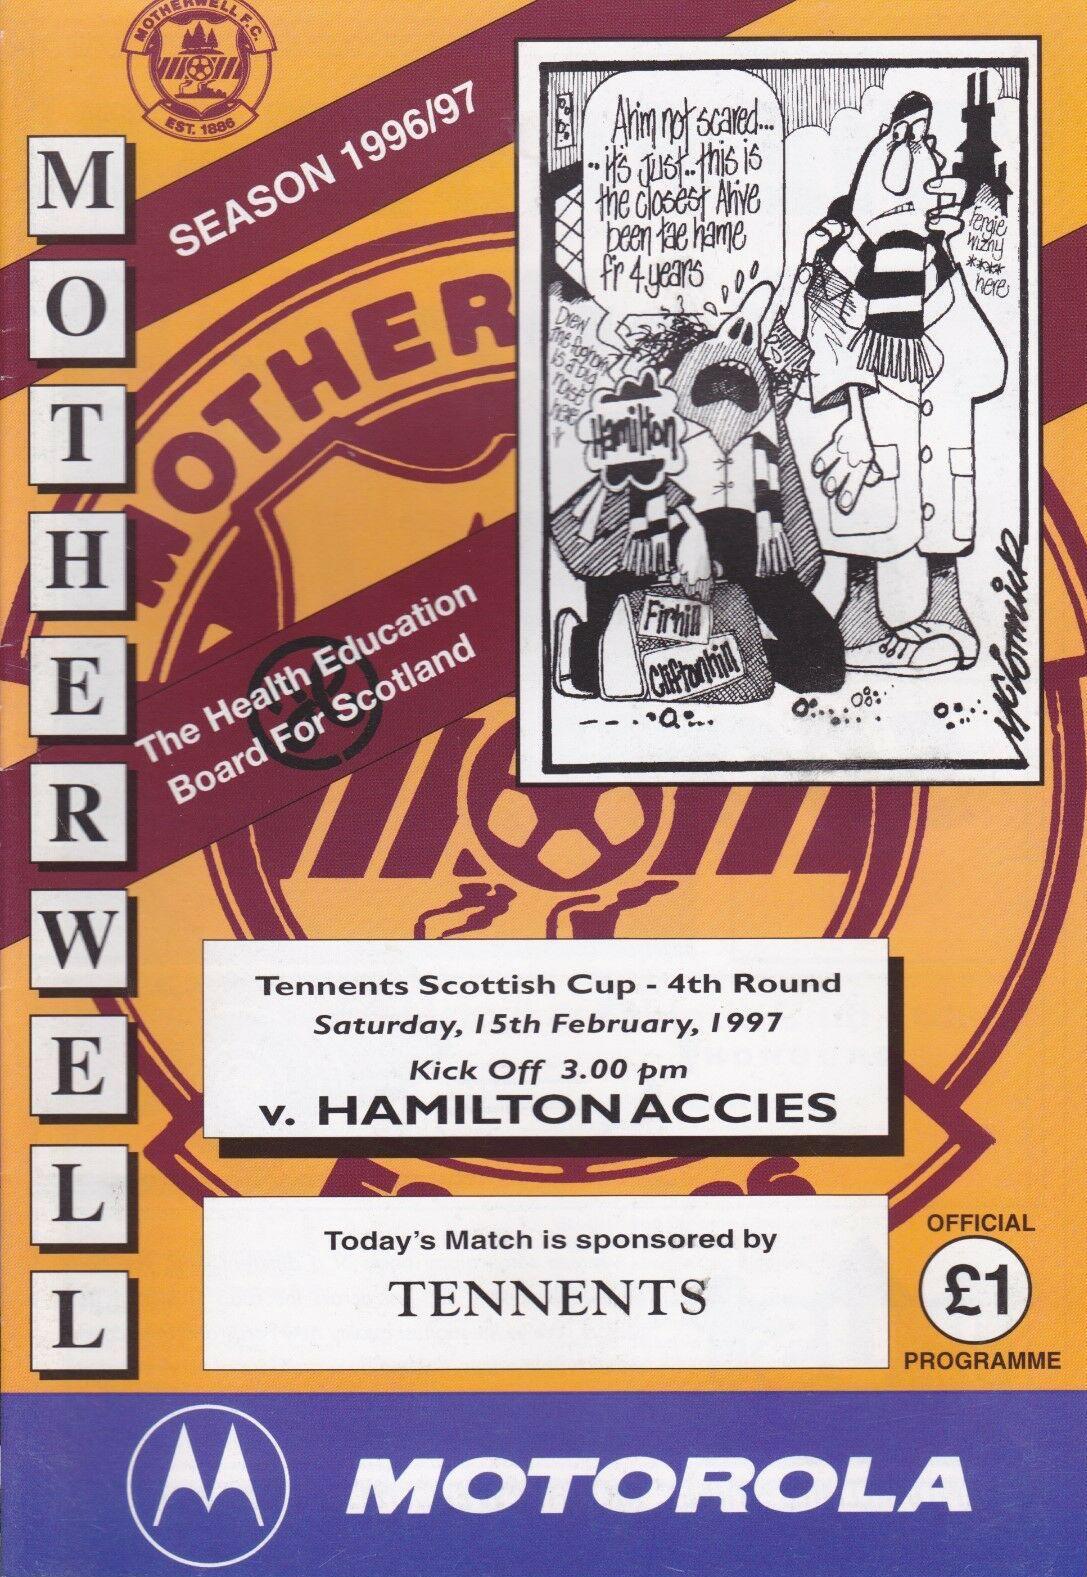 versus Hamilton Accies Programme Cover